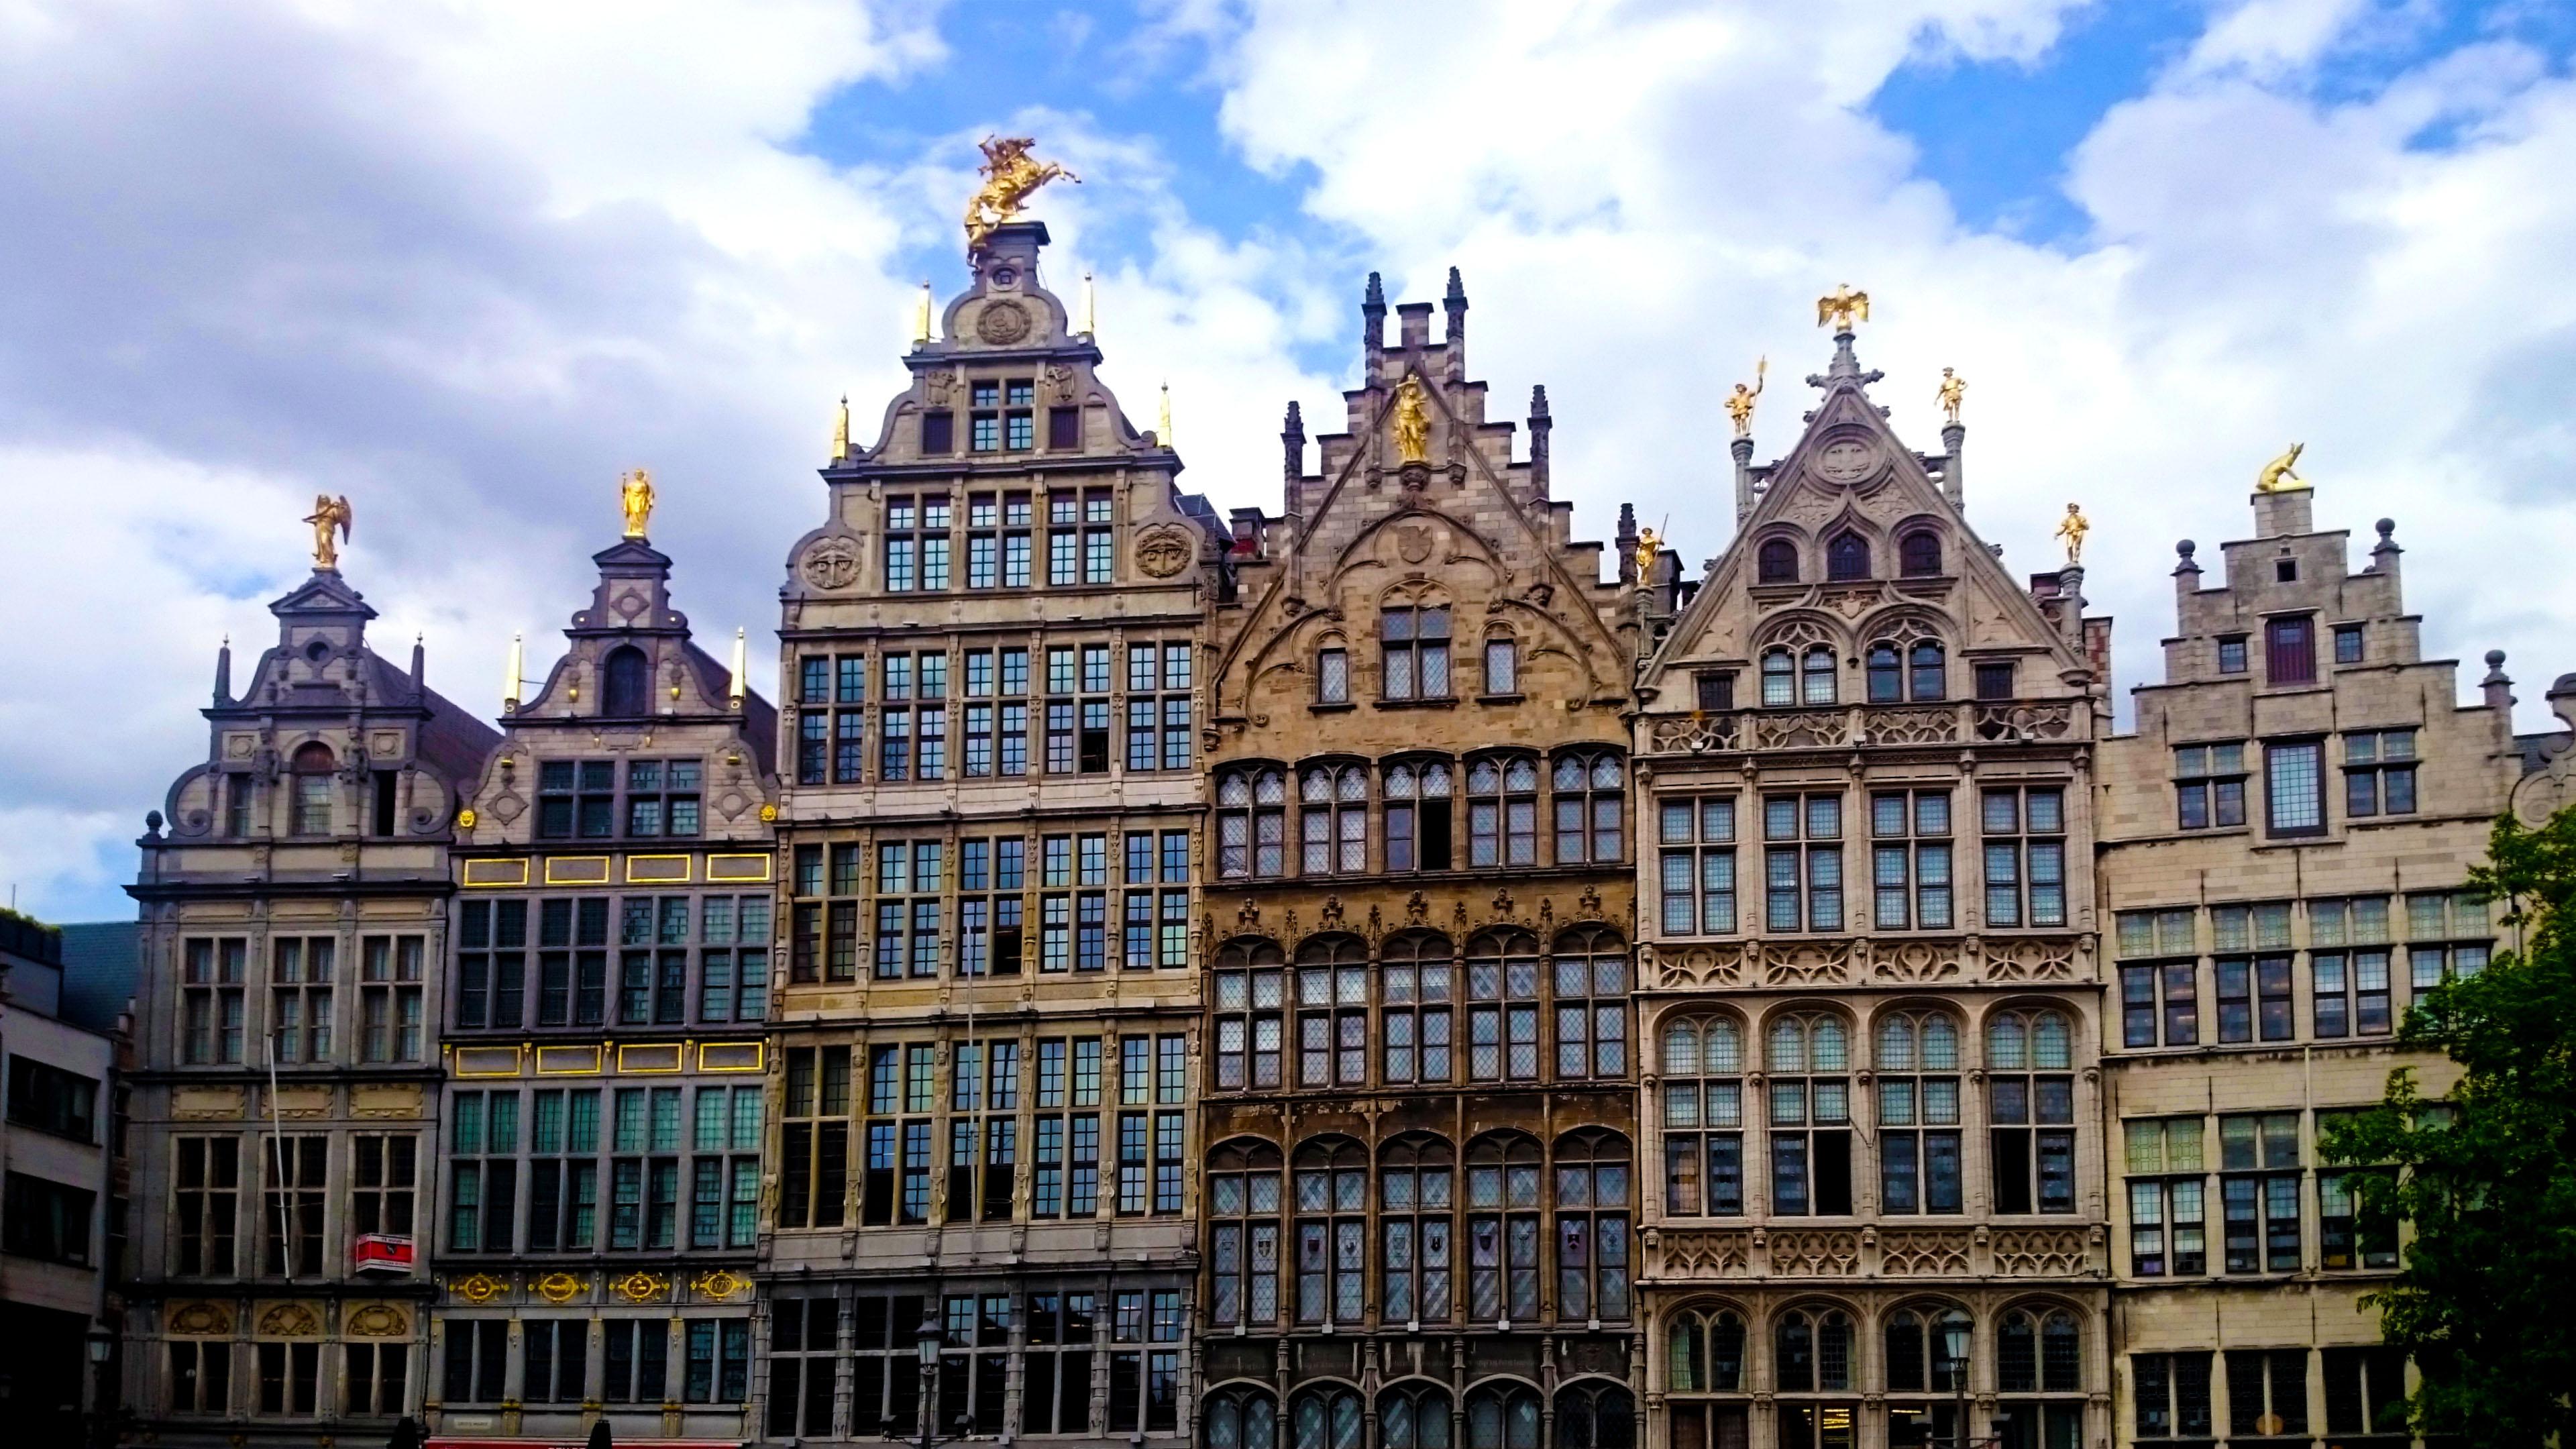 Antwerp - medieval facades